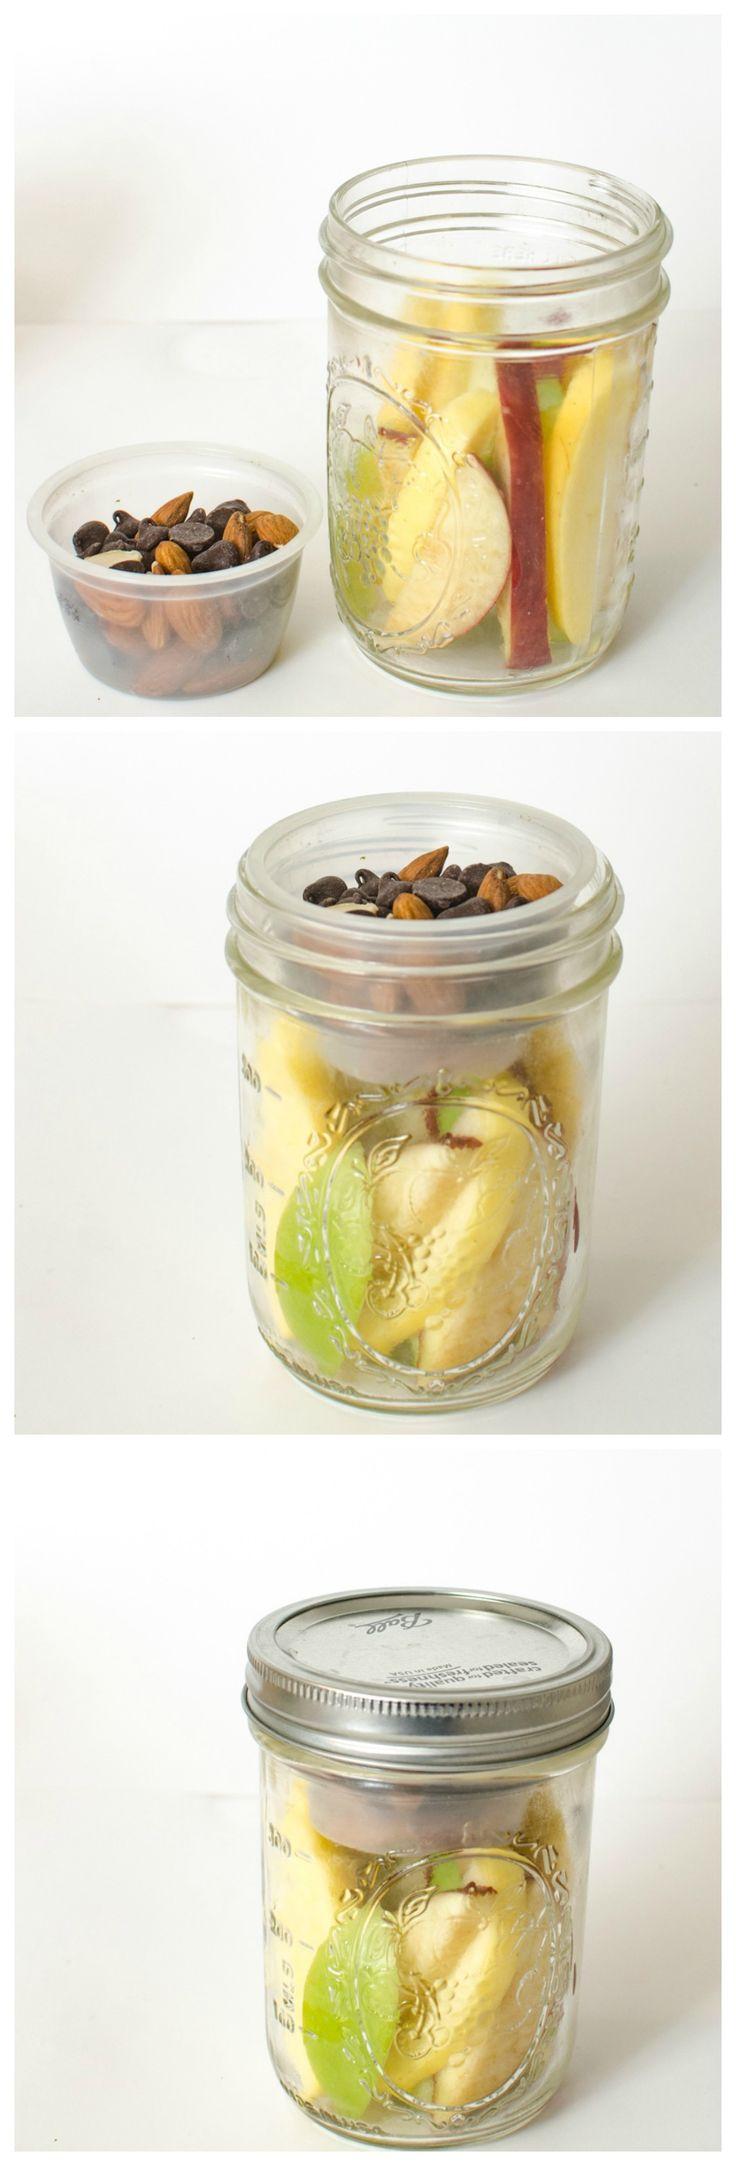 Healthy Snacks in Jars - Apple Slices + Chocolate